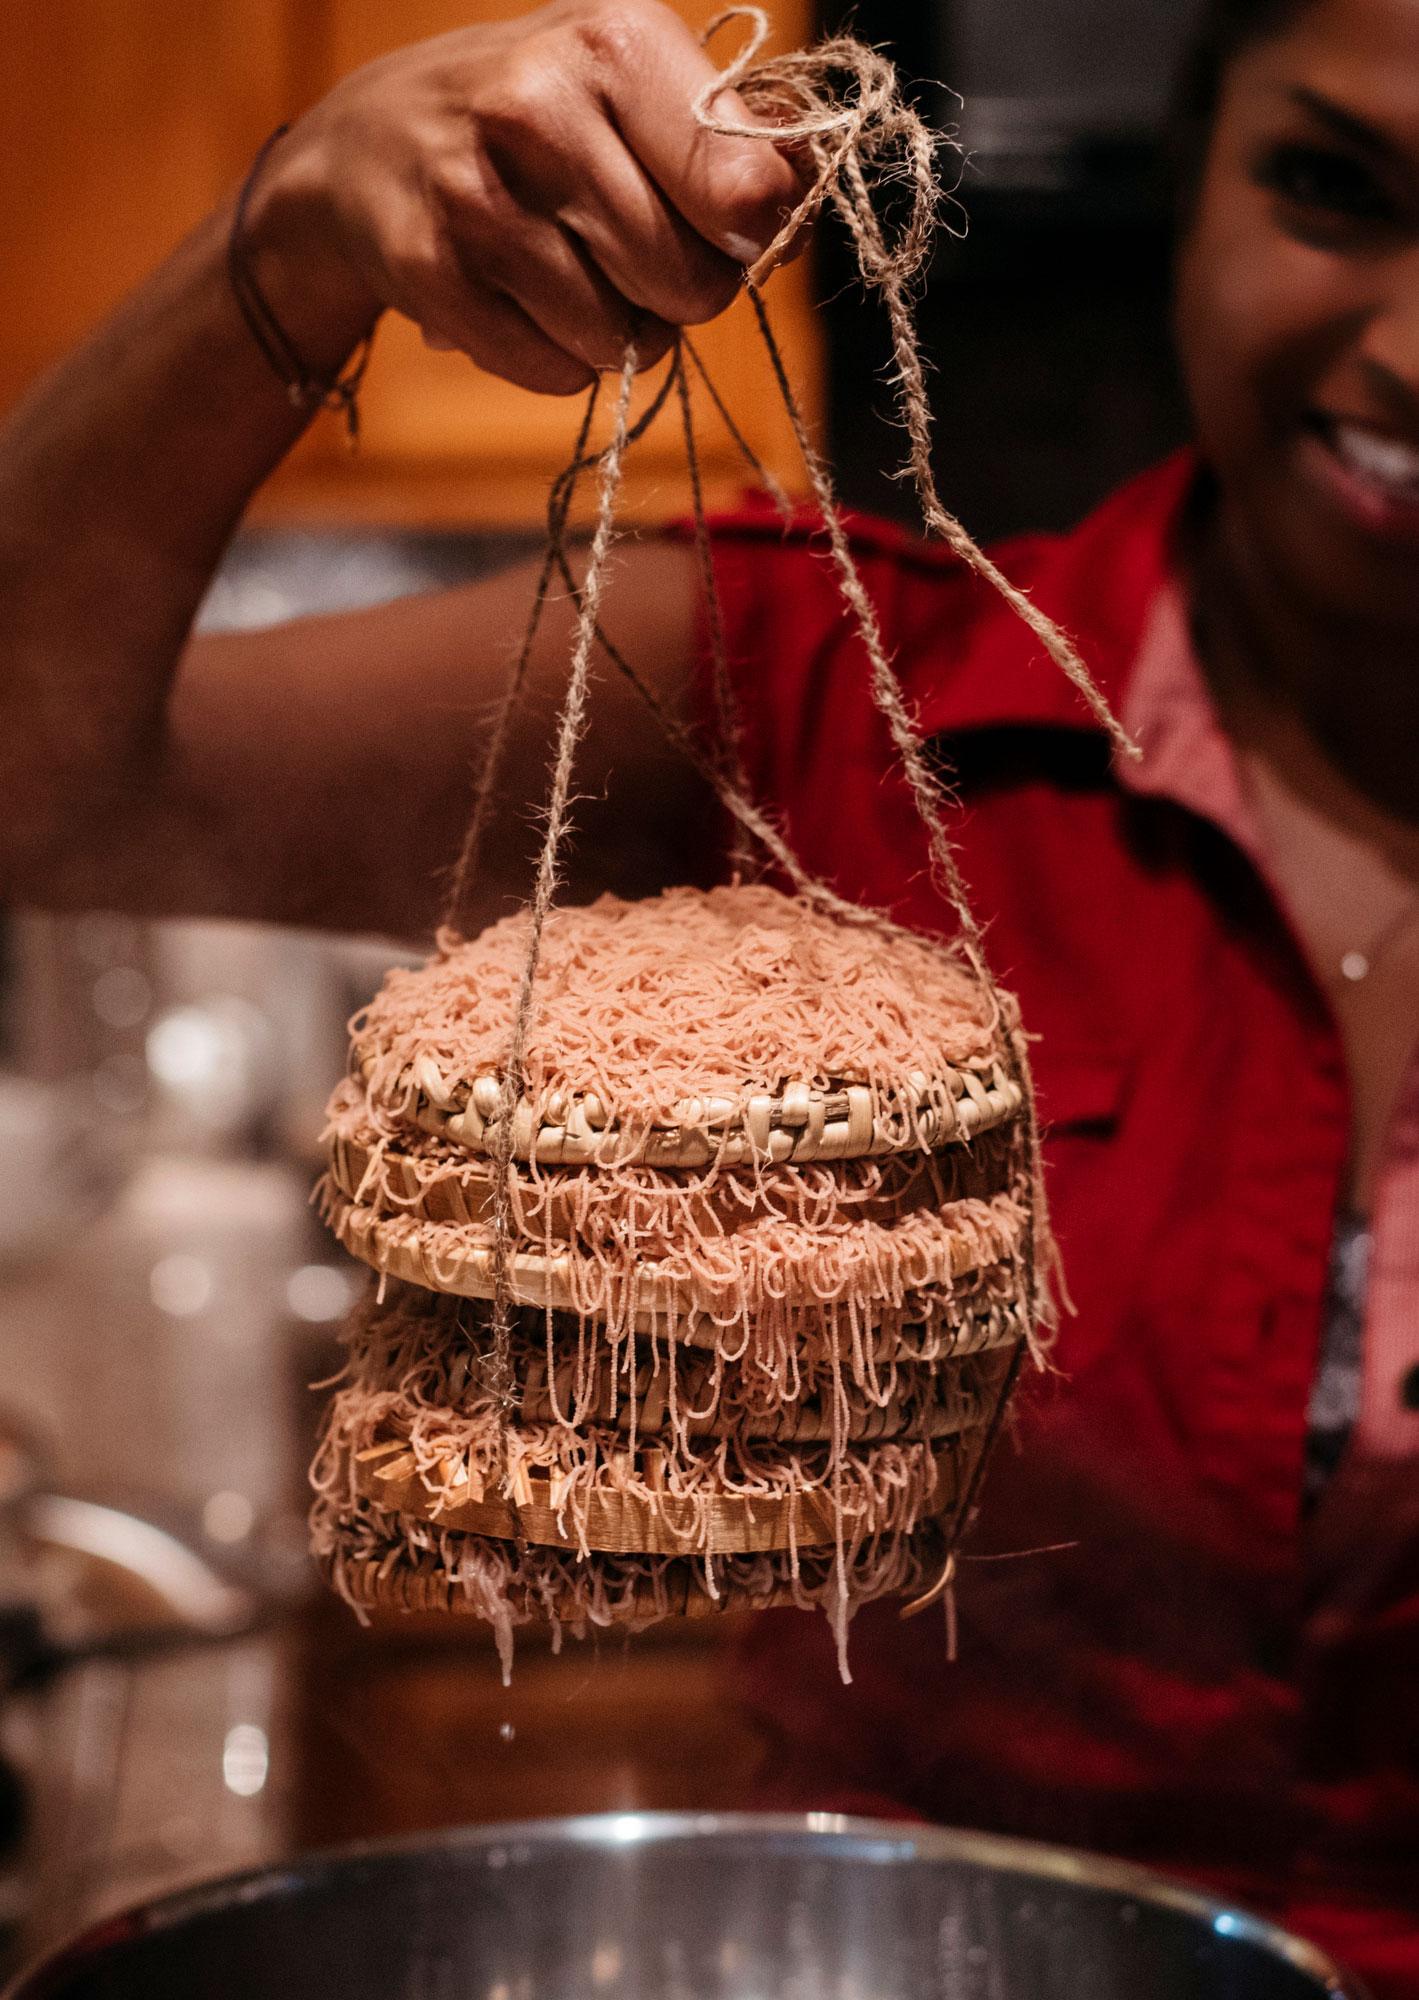 Los_Angeles_Food_photographer_Rebecca_Peloquin_Sri_Lankan_Food_021.JPG